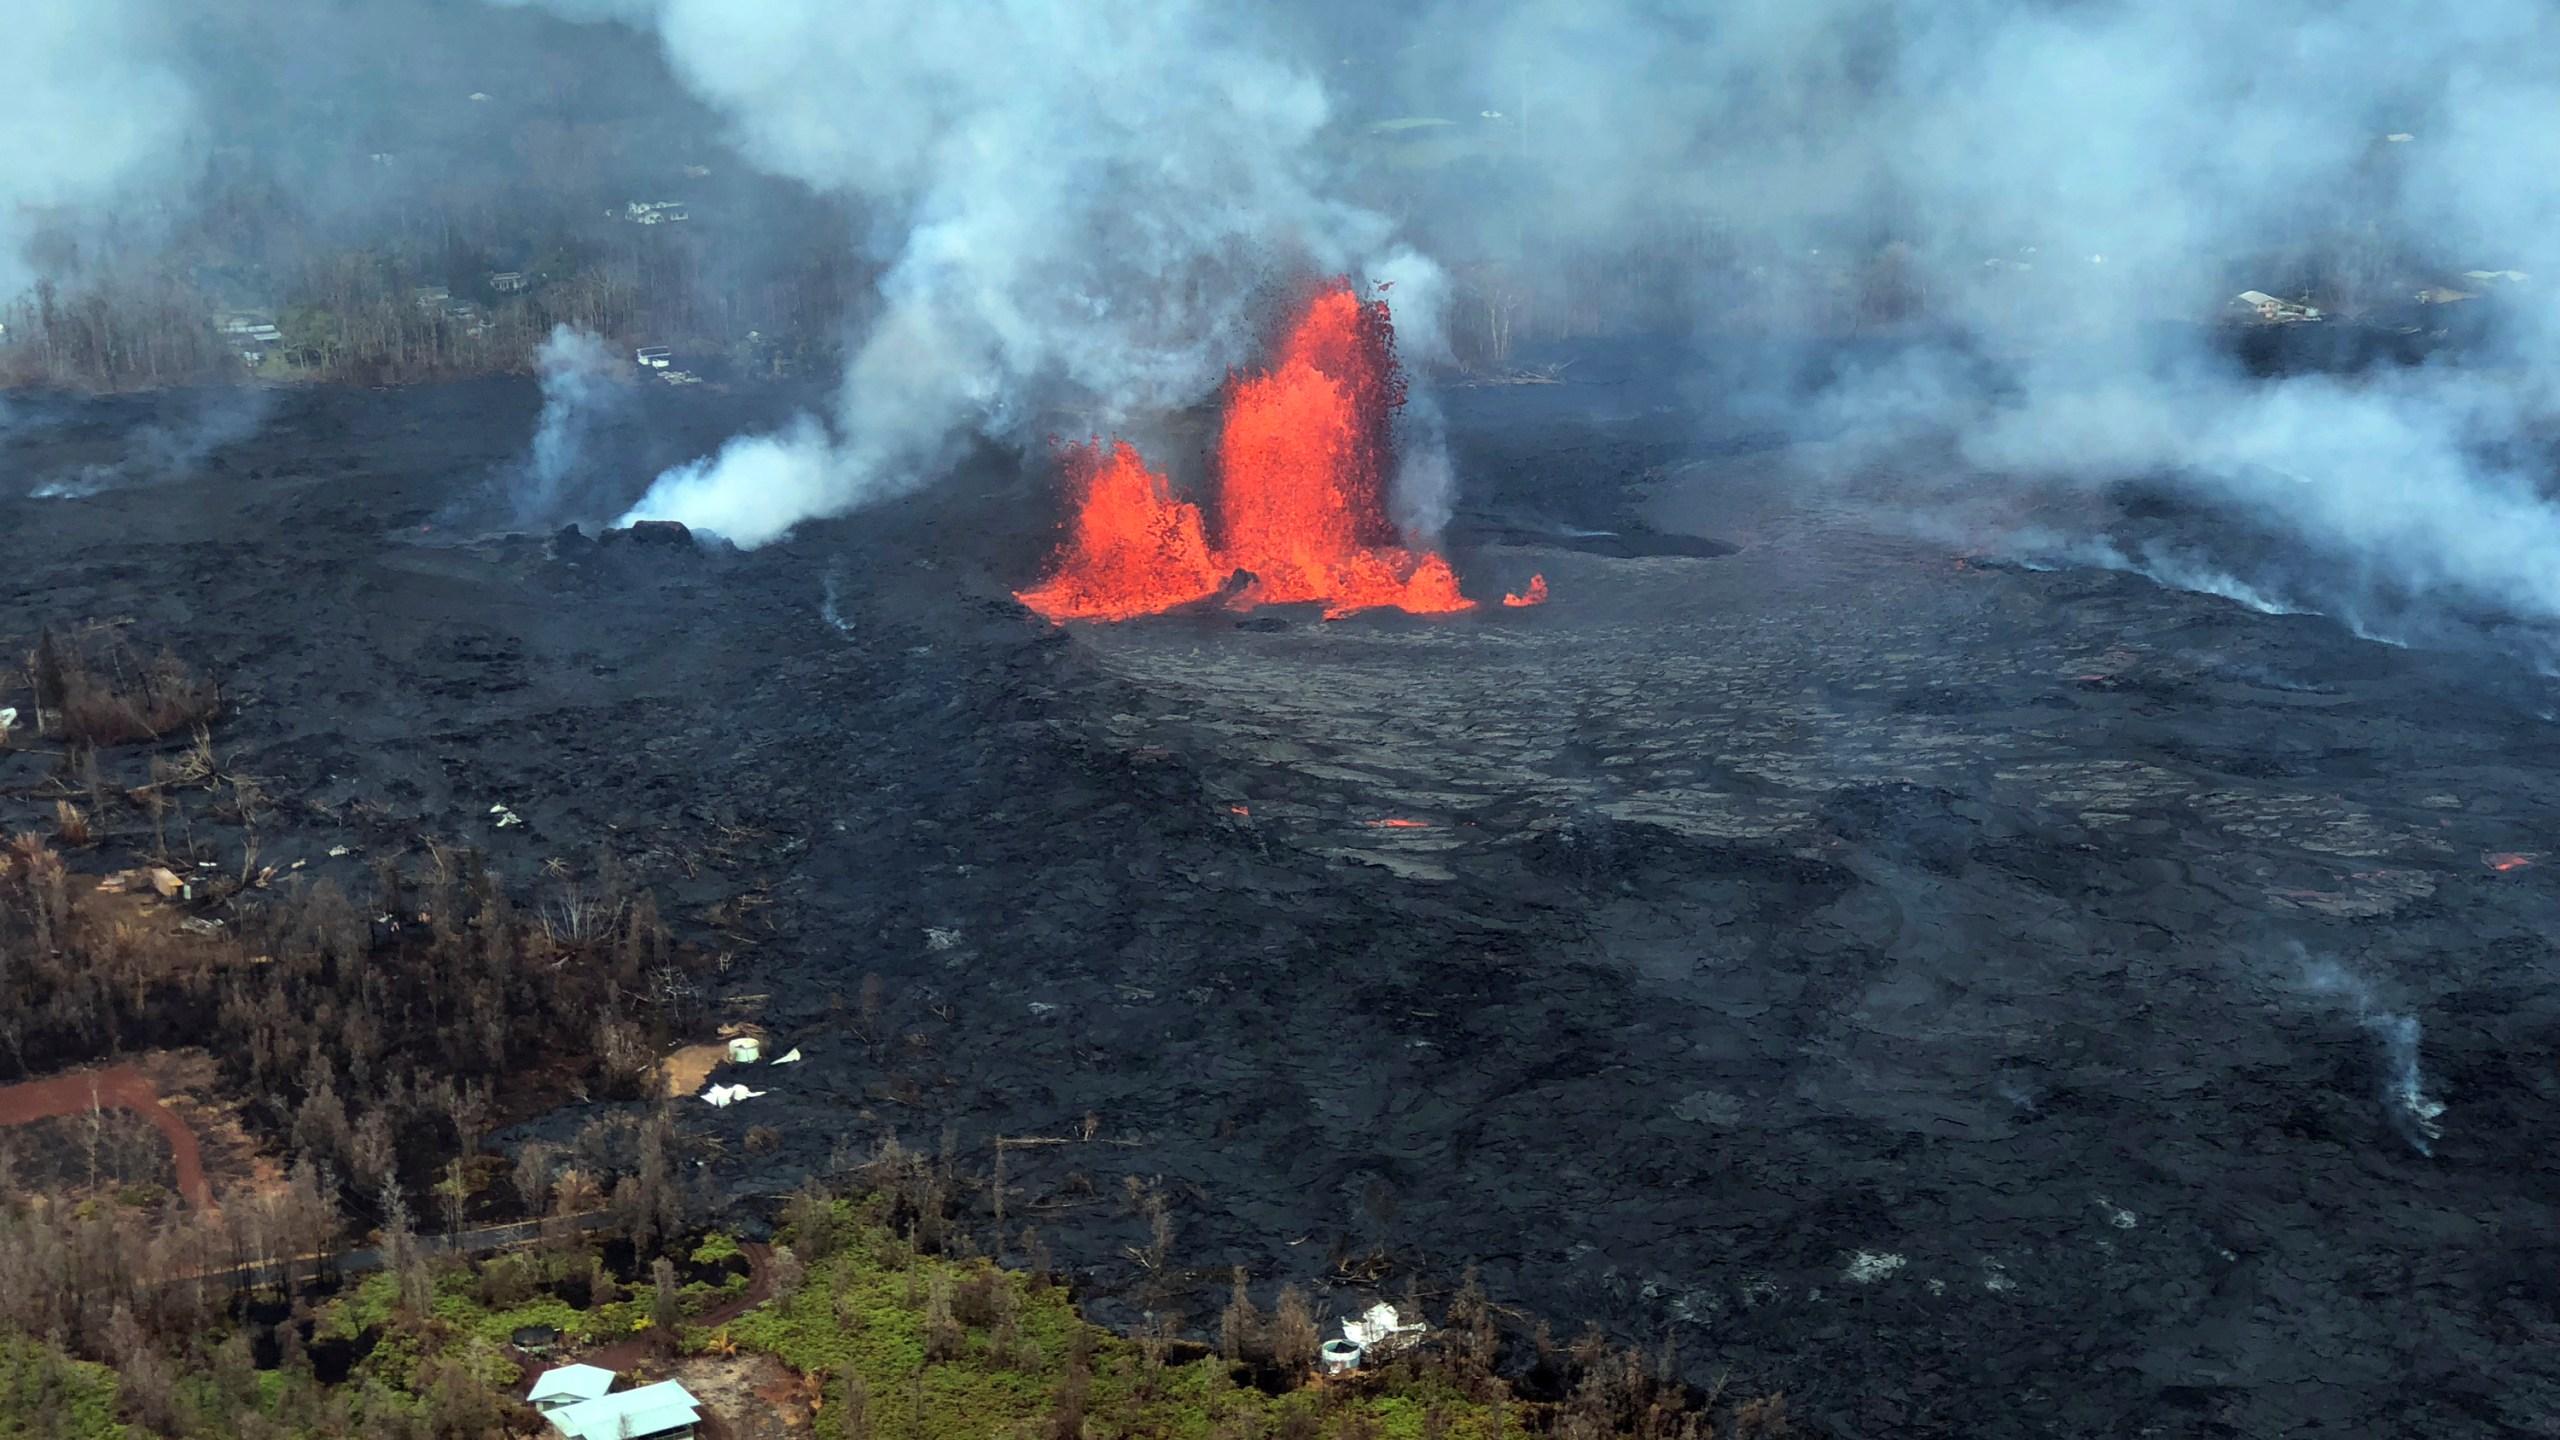 APTOPIX_Hawaii_Volcano_07637-159532.jpg49108621